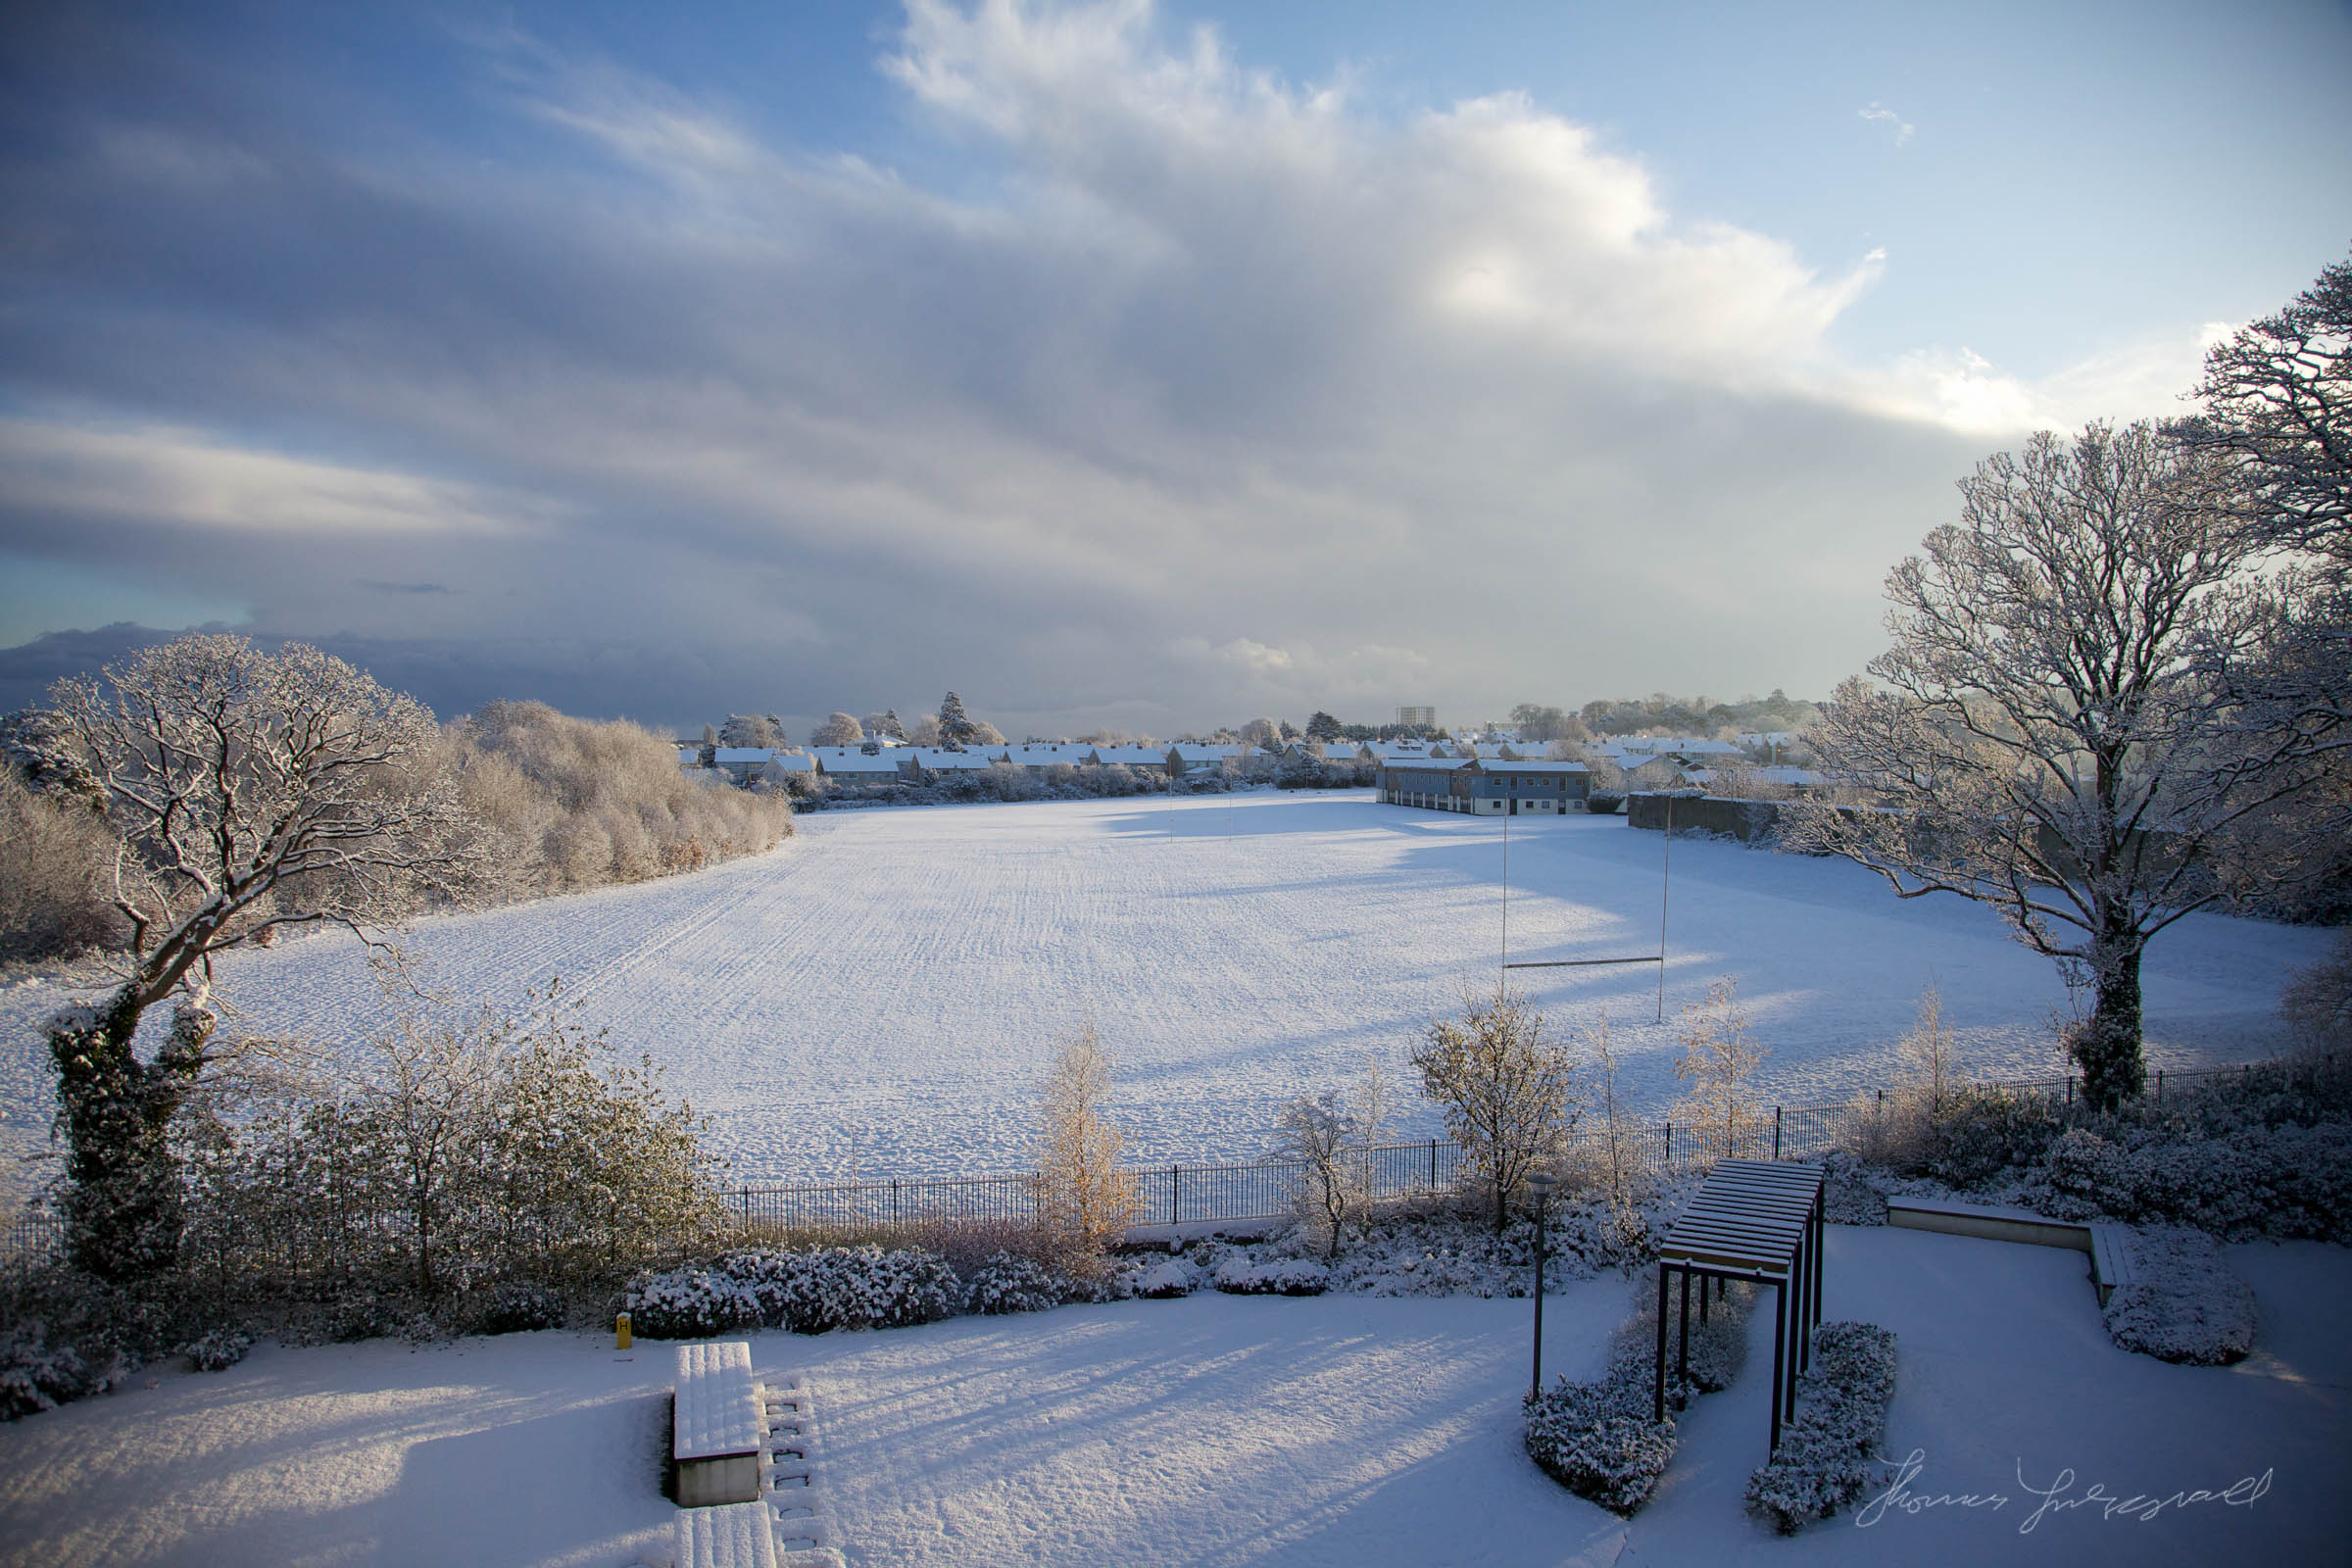 Winter-Light-Ireland-03.jpg